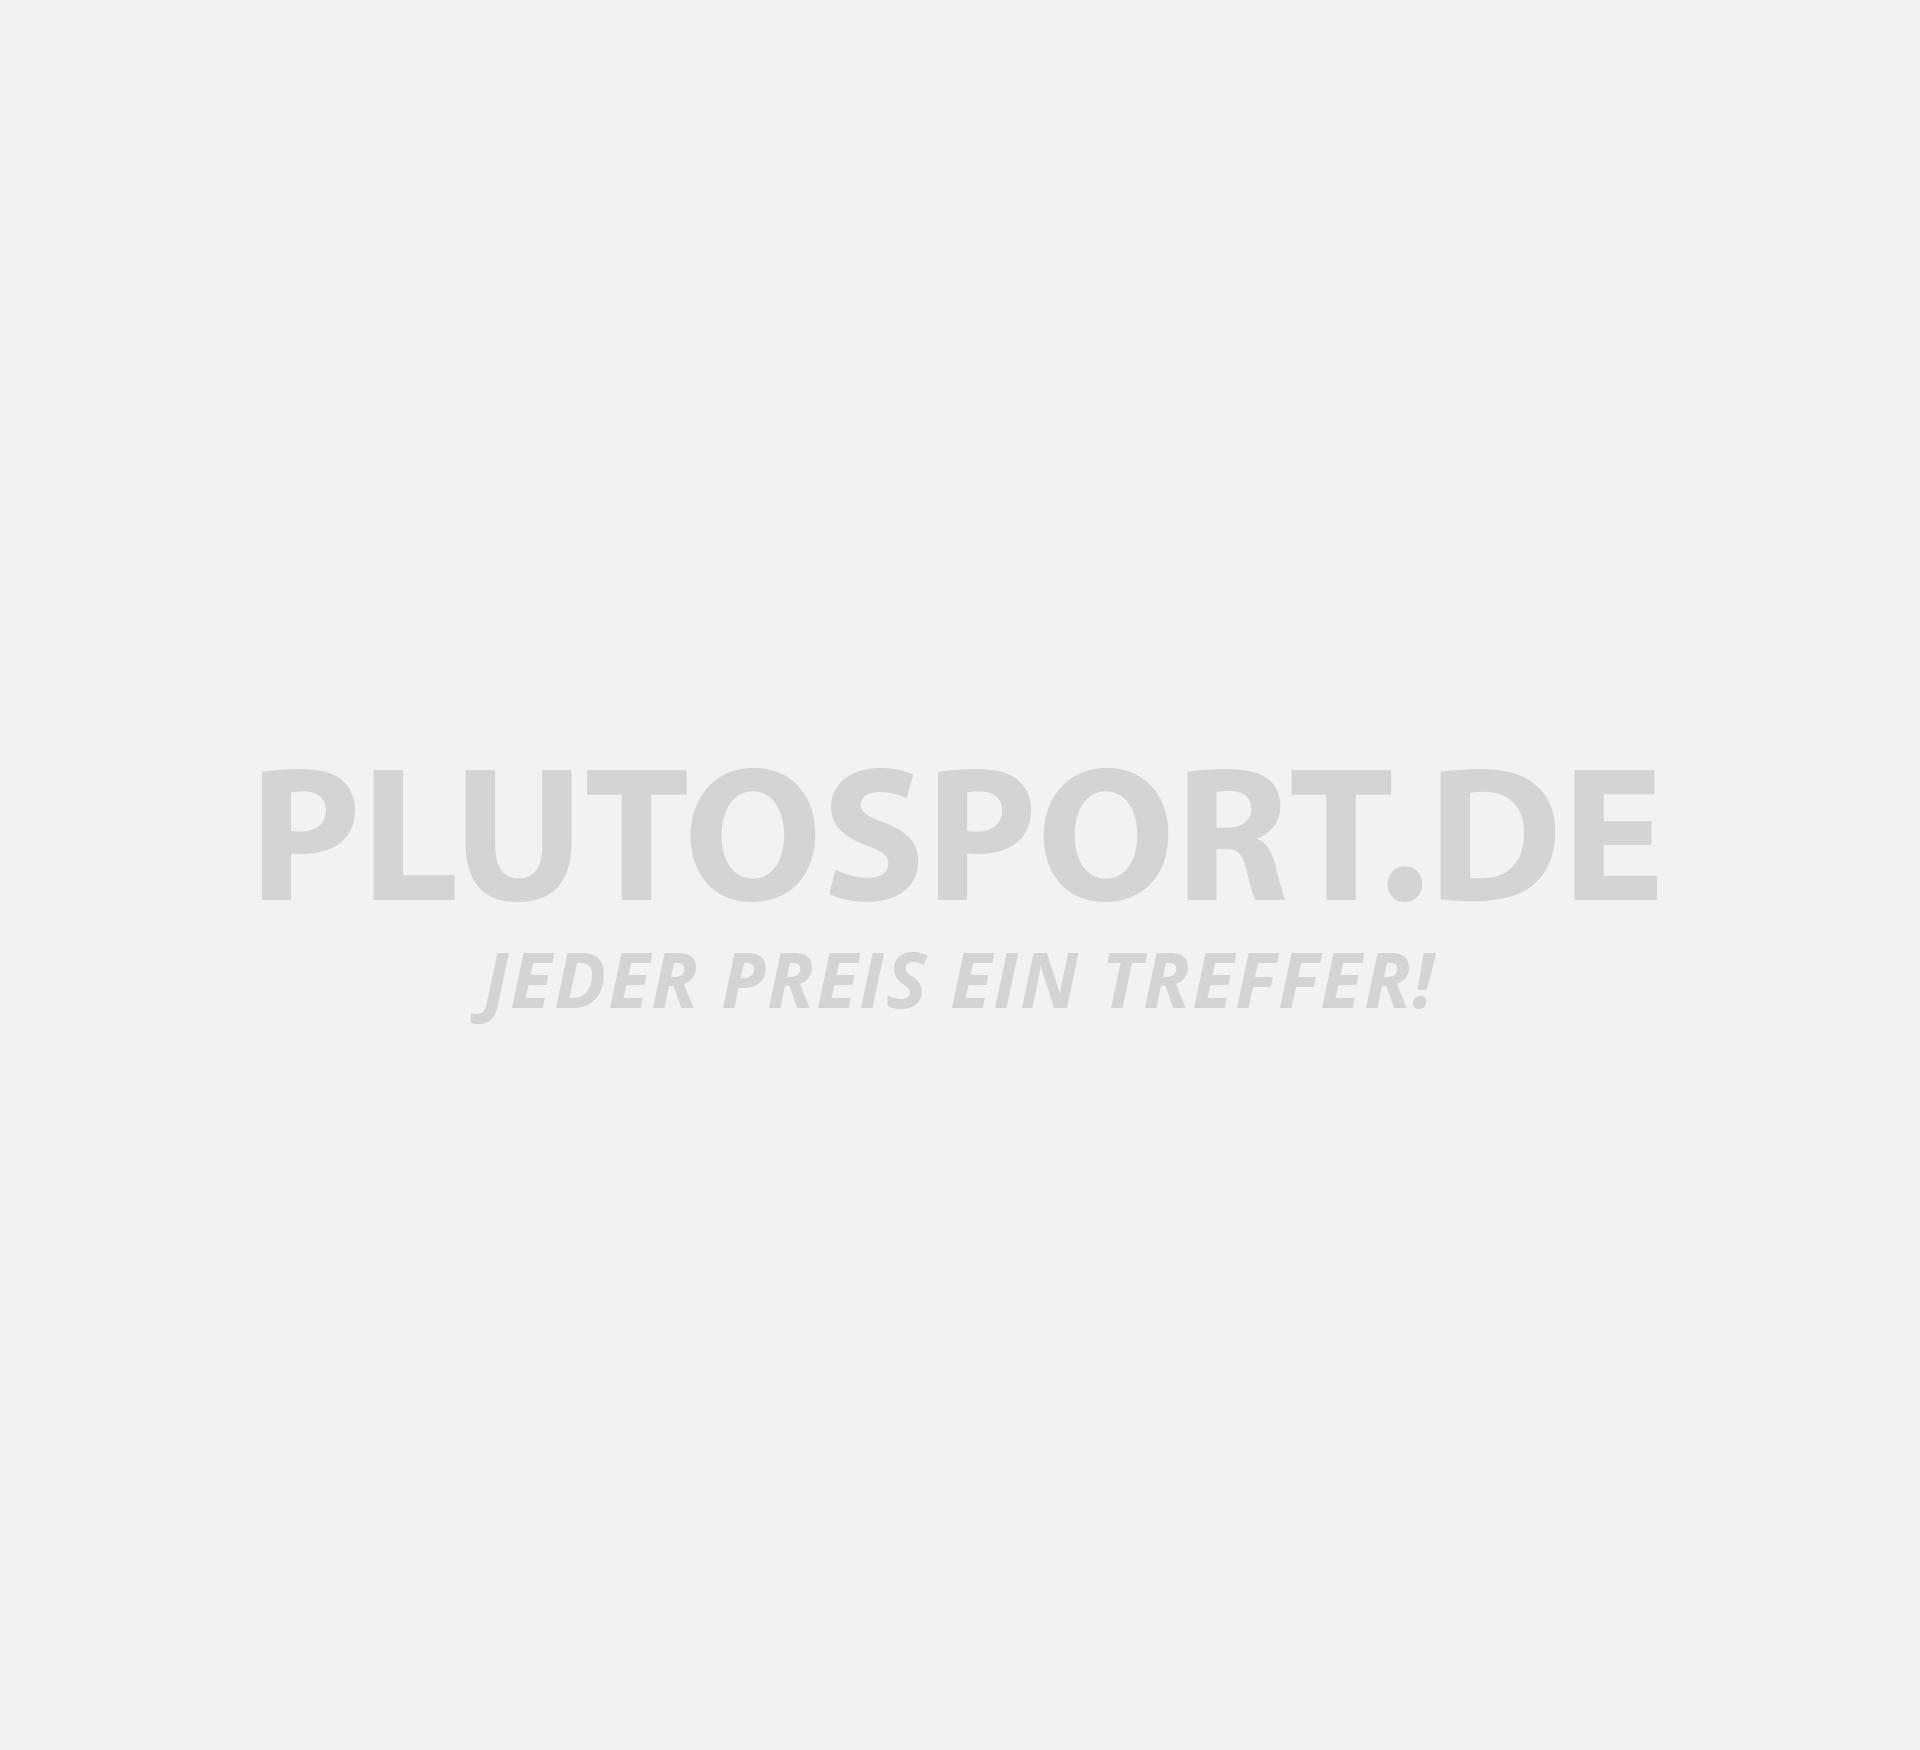 Asics Sprinter Short Women